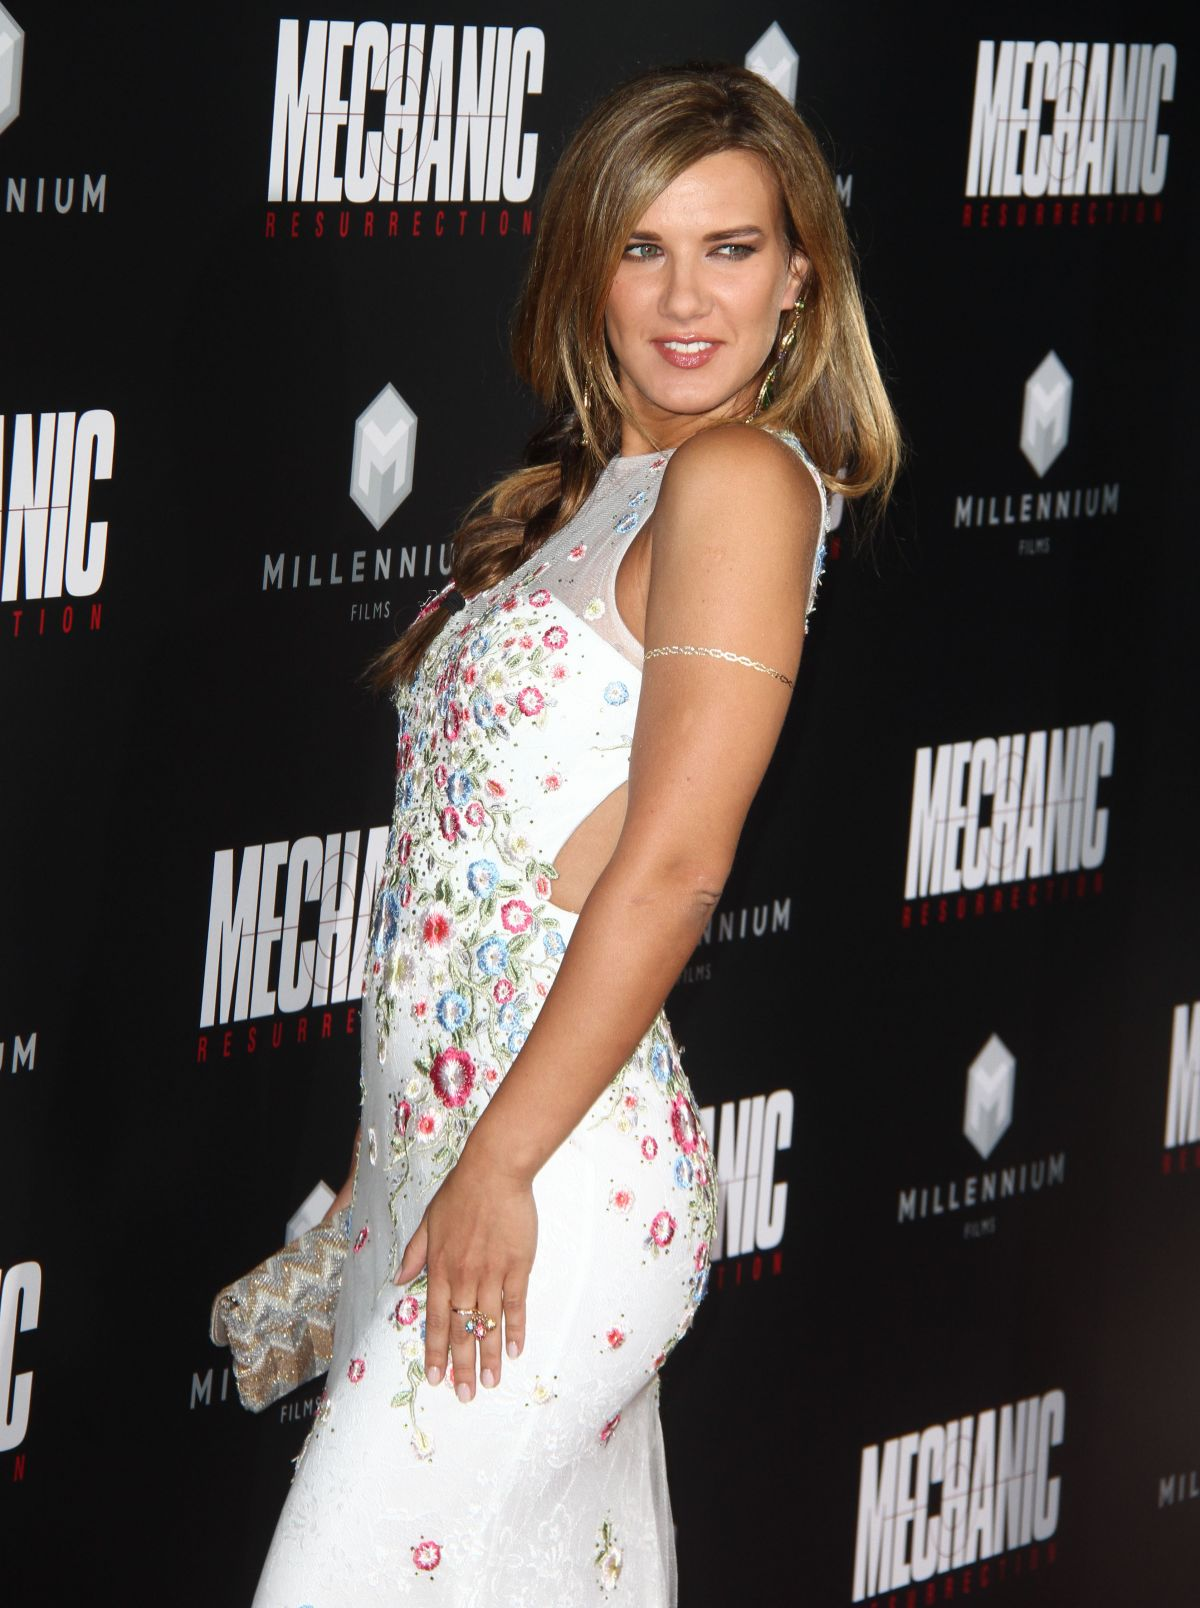 NATALIE BURN at 'Mechanic: Resurrection' Premiere in ...